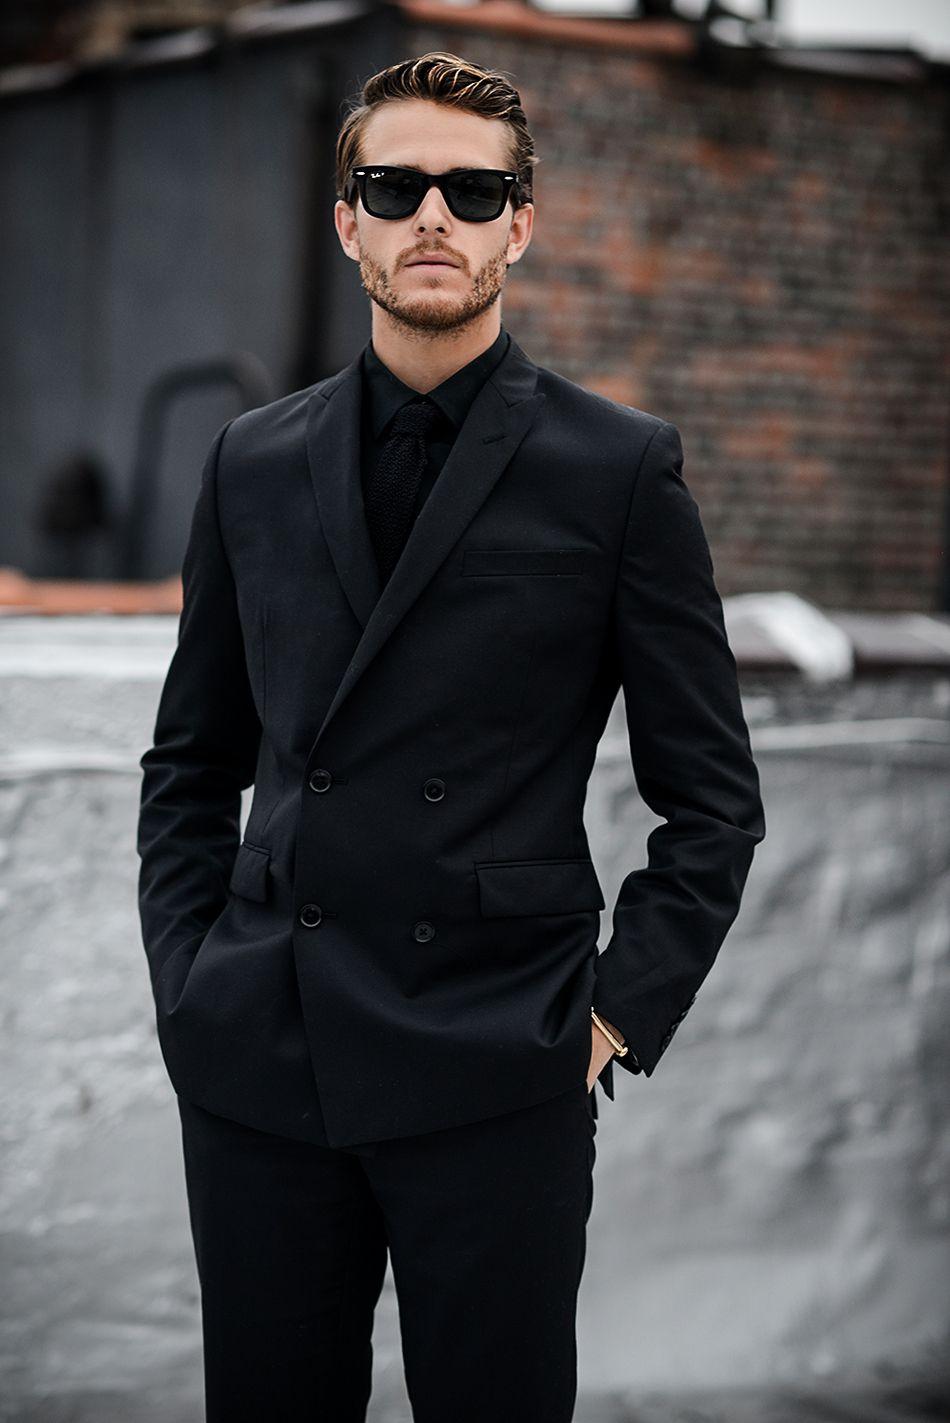 zapatos azules camisa negra negra camisa tnqvF